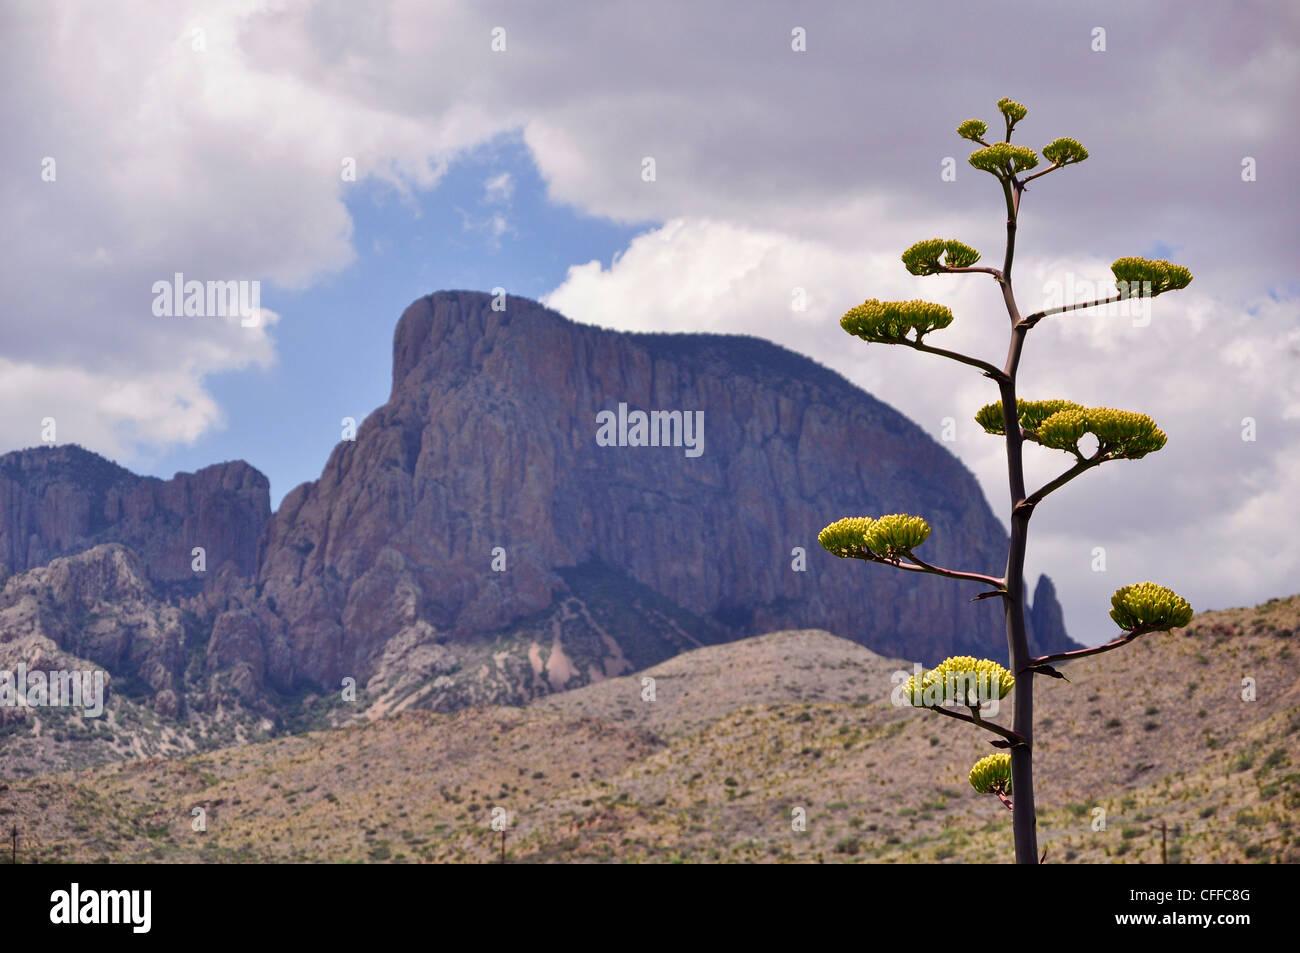 A Century Plant adorns the mountainous landscape of Big Bend National Park. - Stock Image